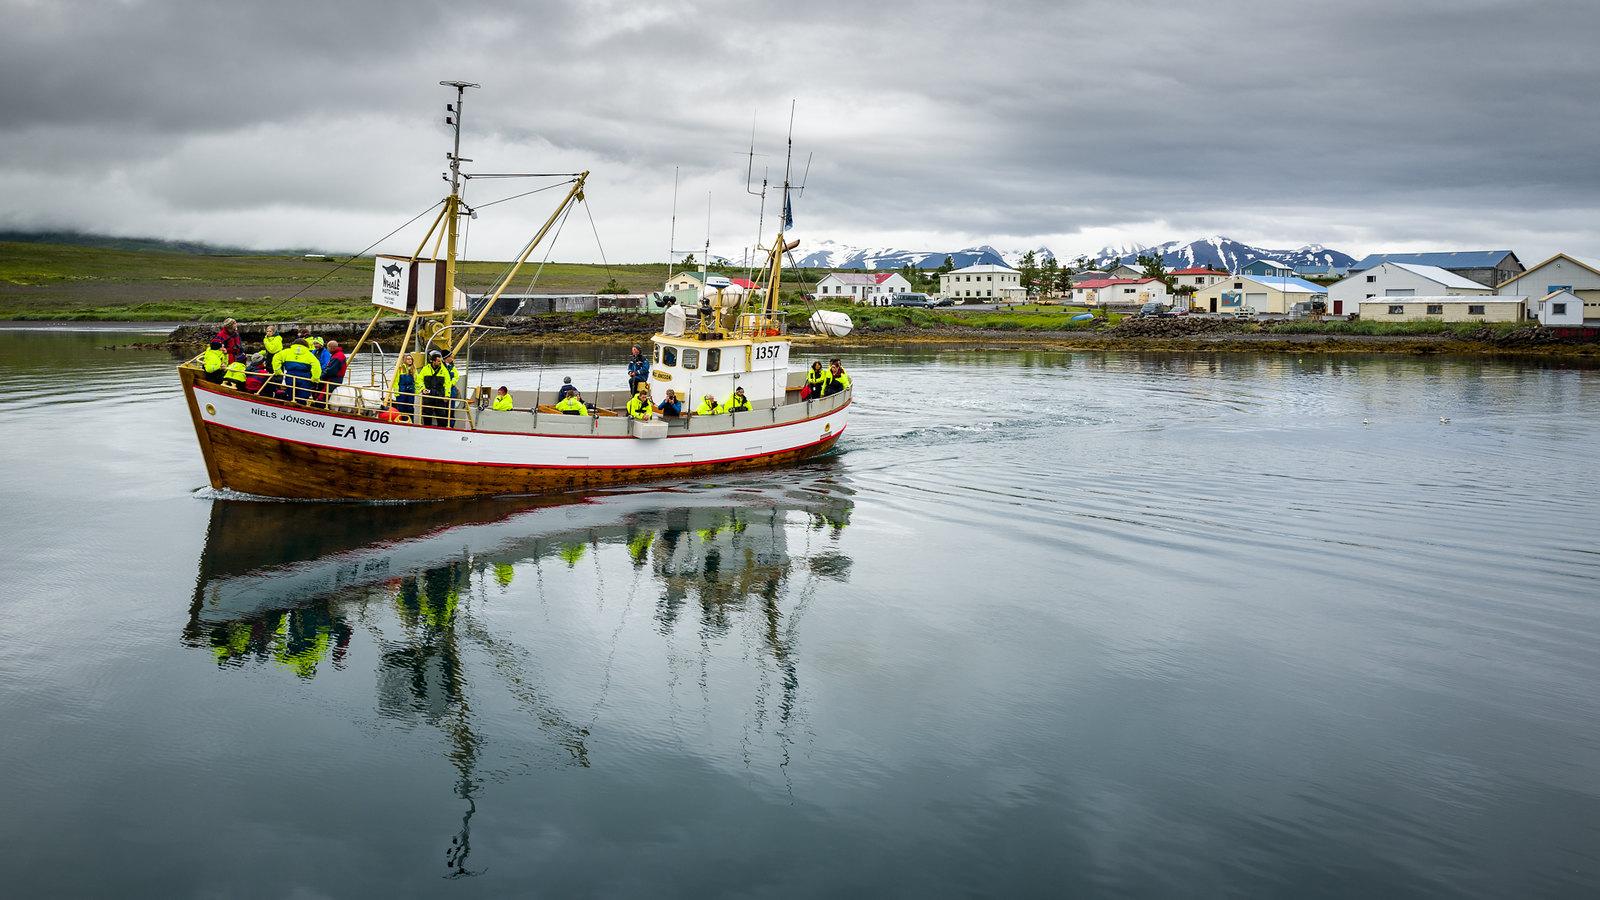 Niels Jonsson whale watcher